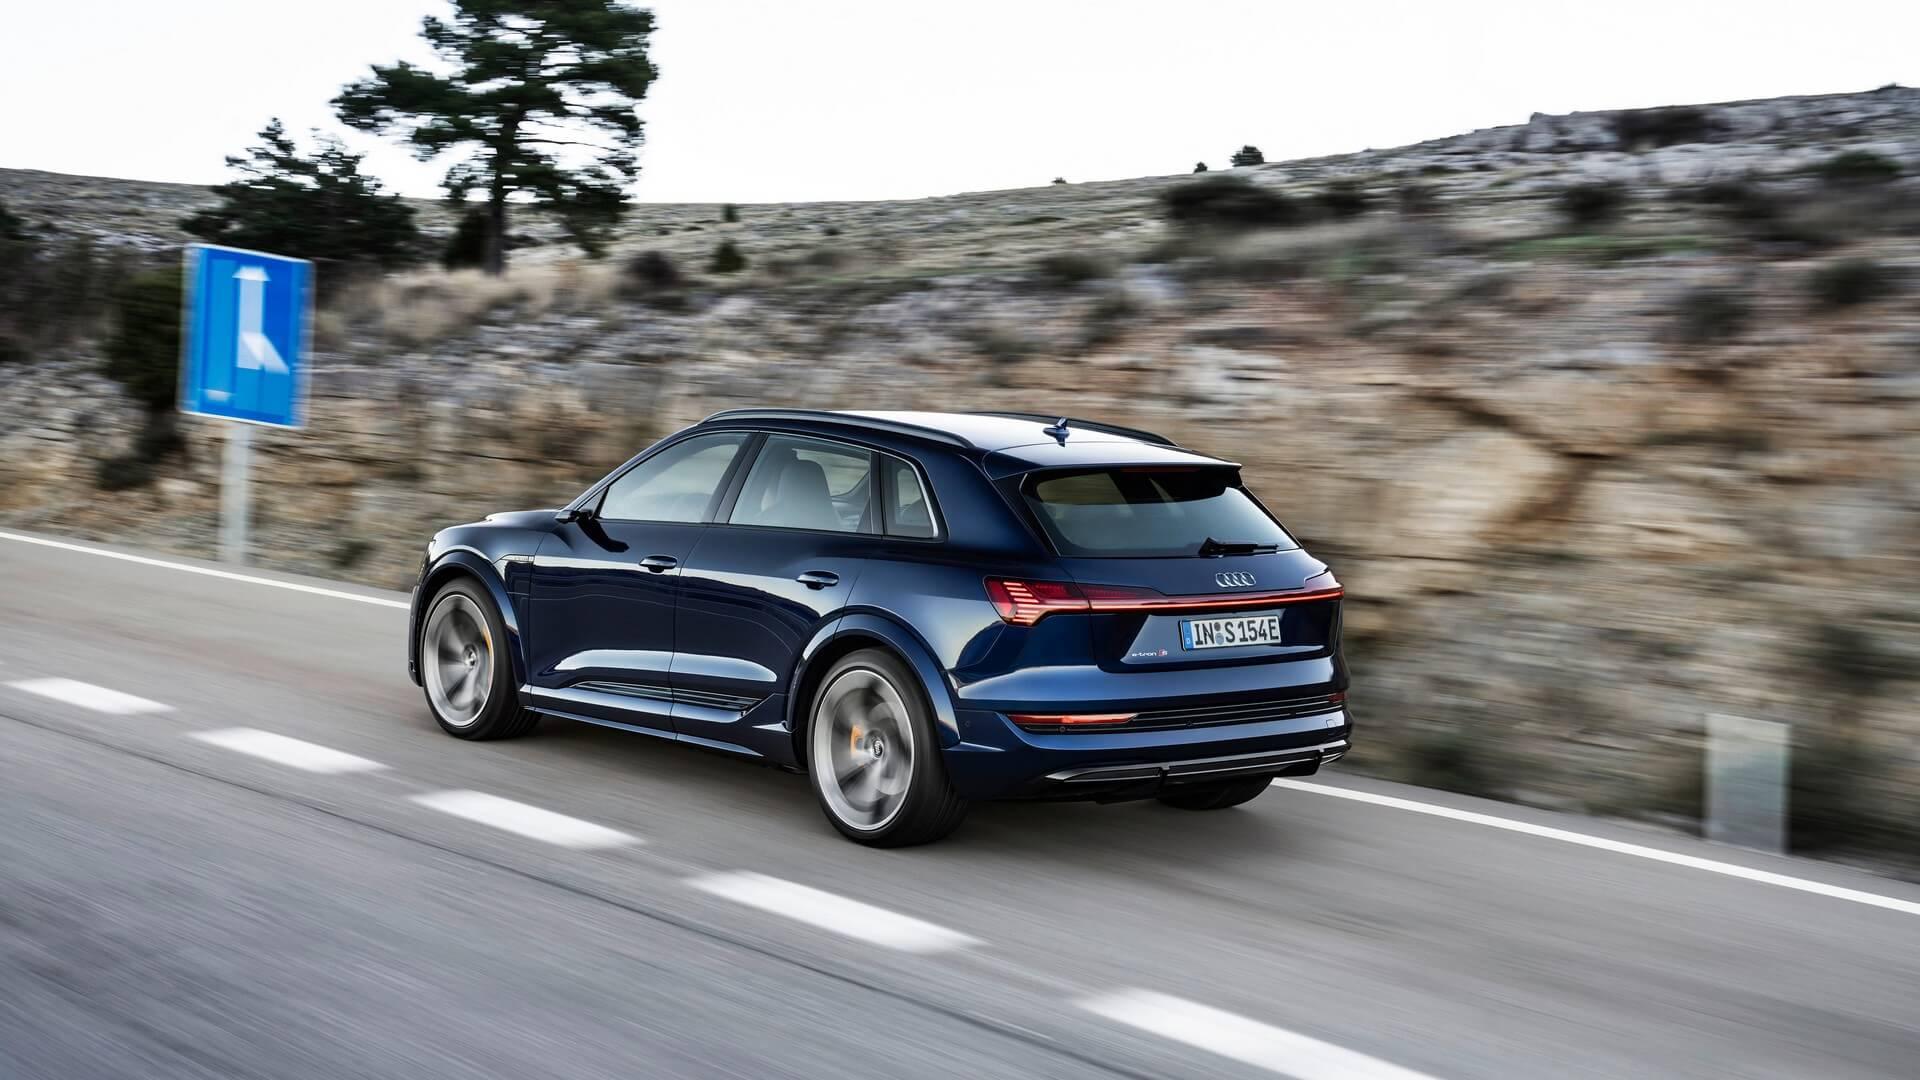 Audi-E-Tron-S-and-E-Tron-S-Sportback-2020-11